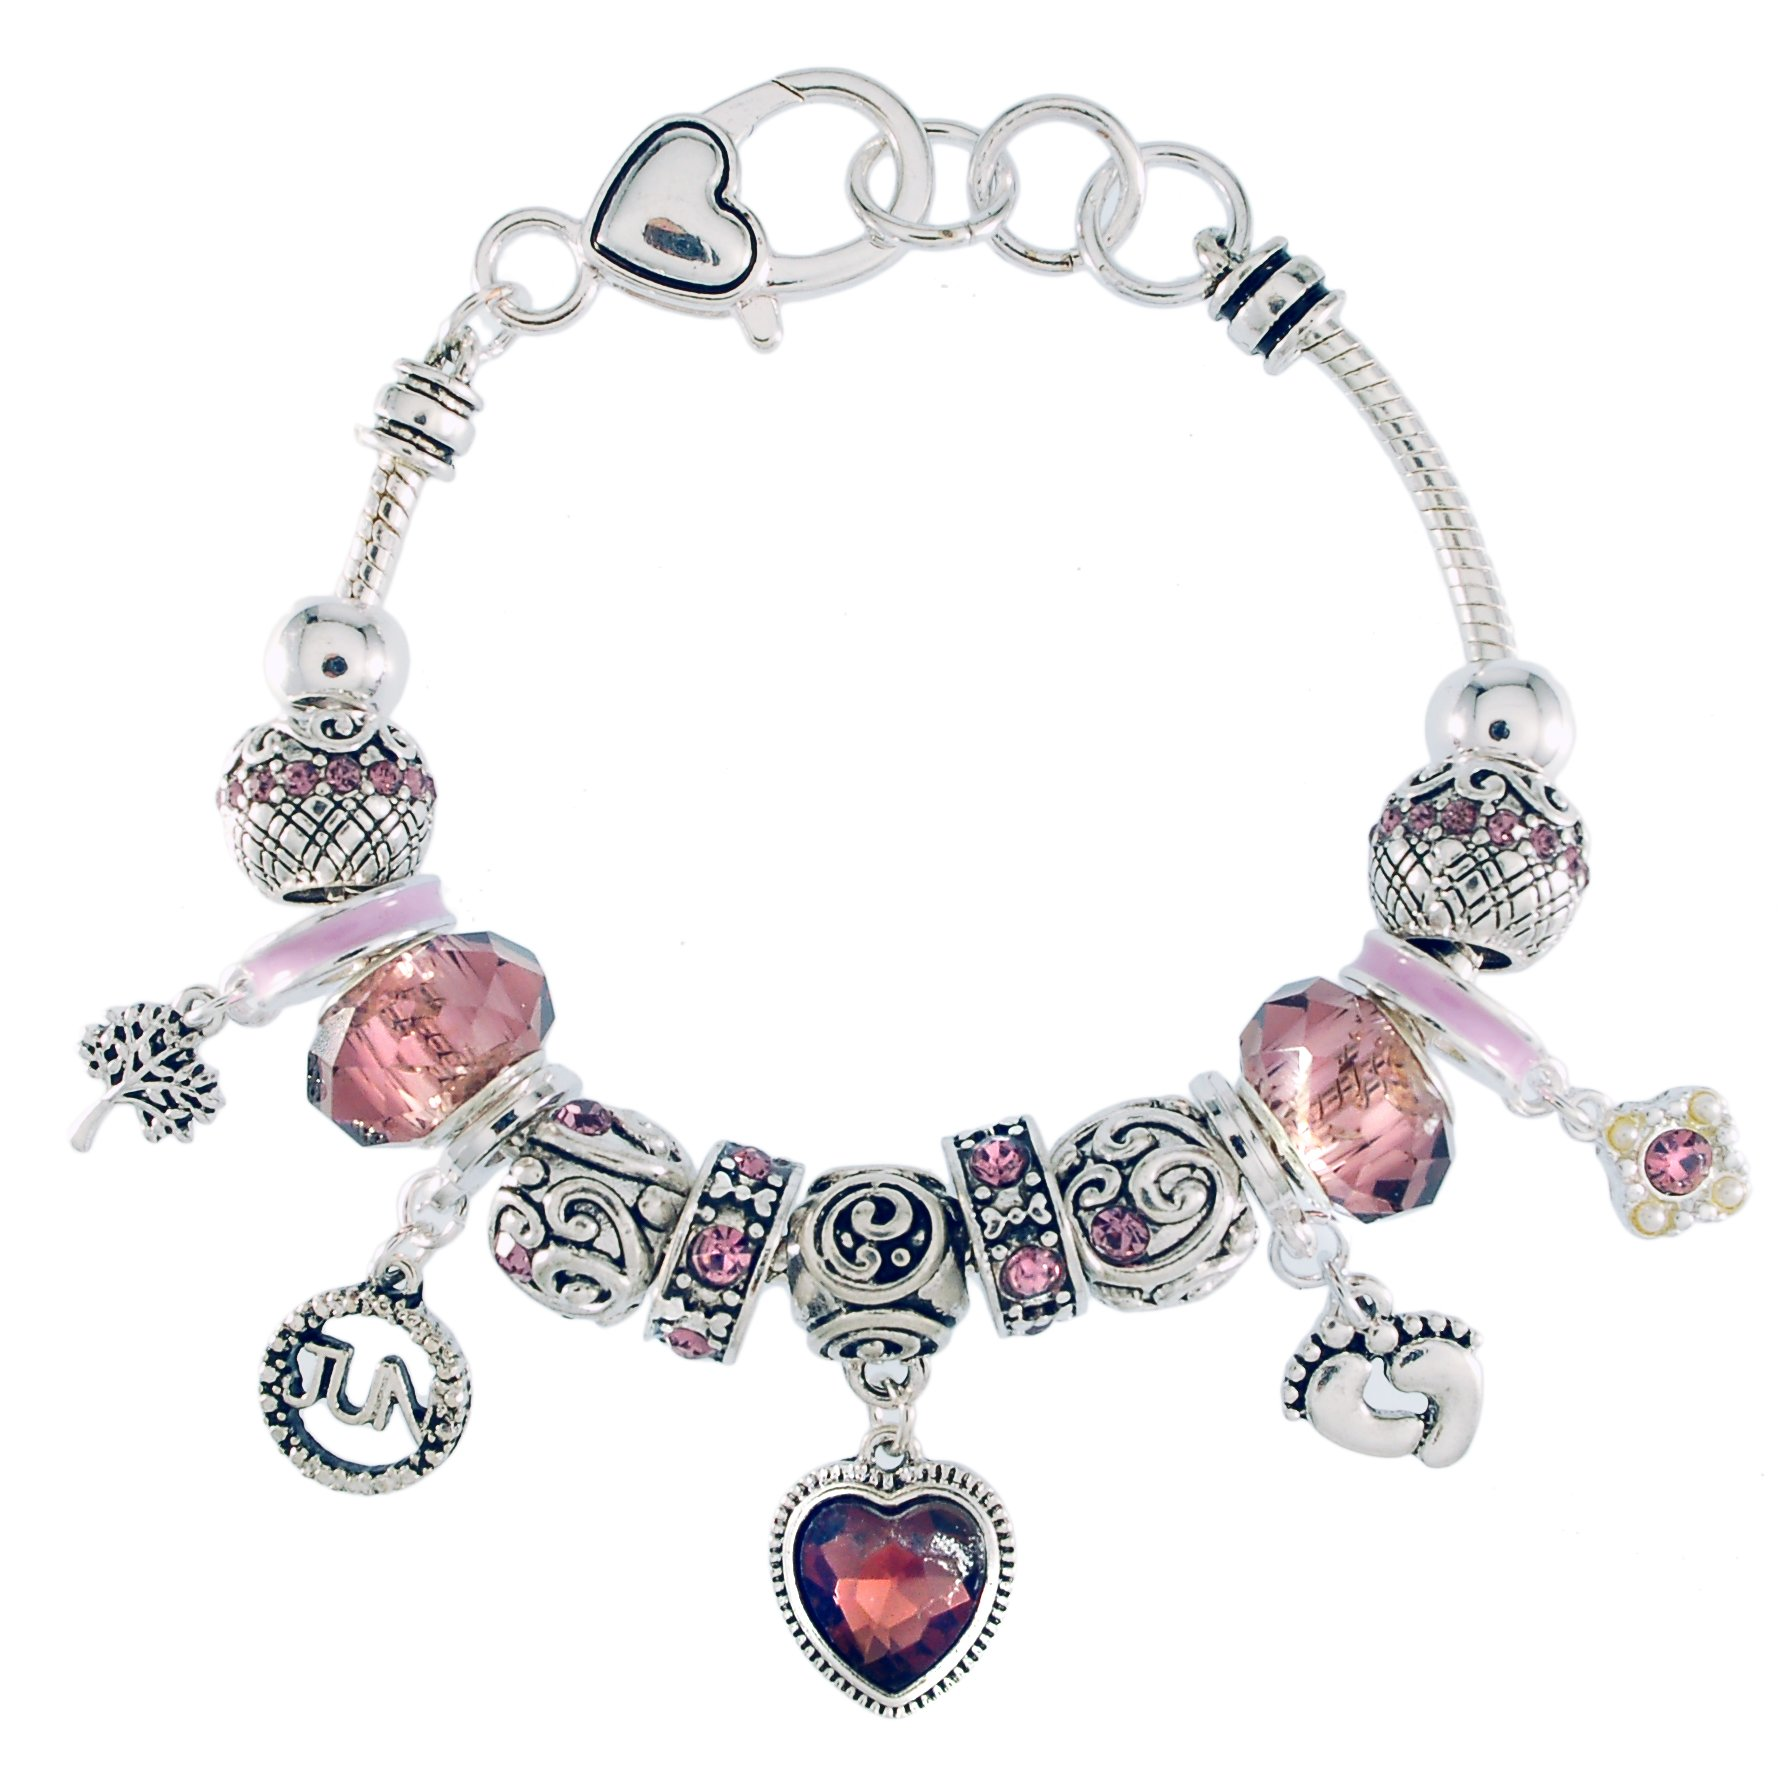 Landau Ambrosia June Birthstone Charm Bracelet